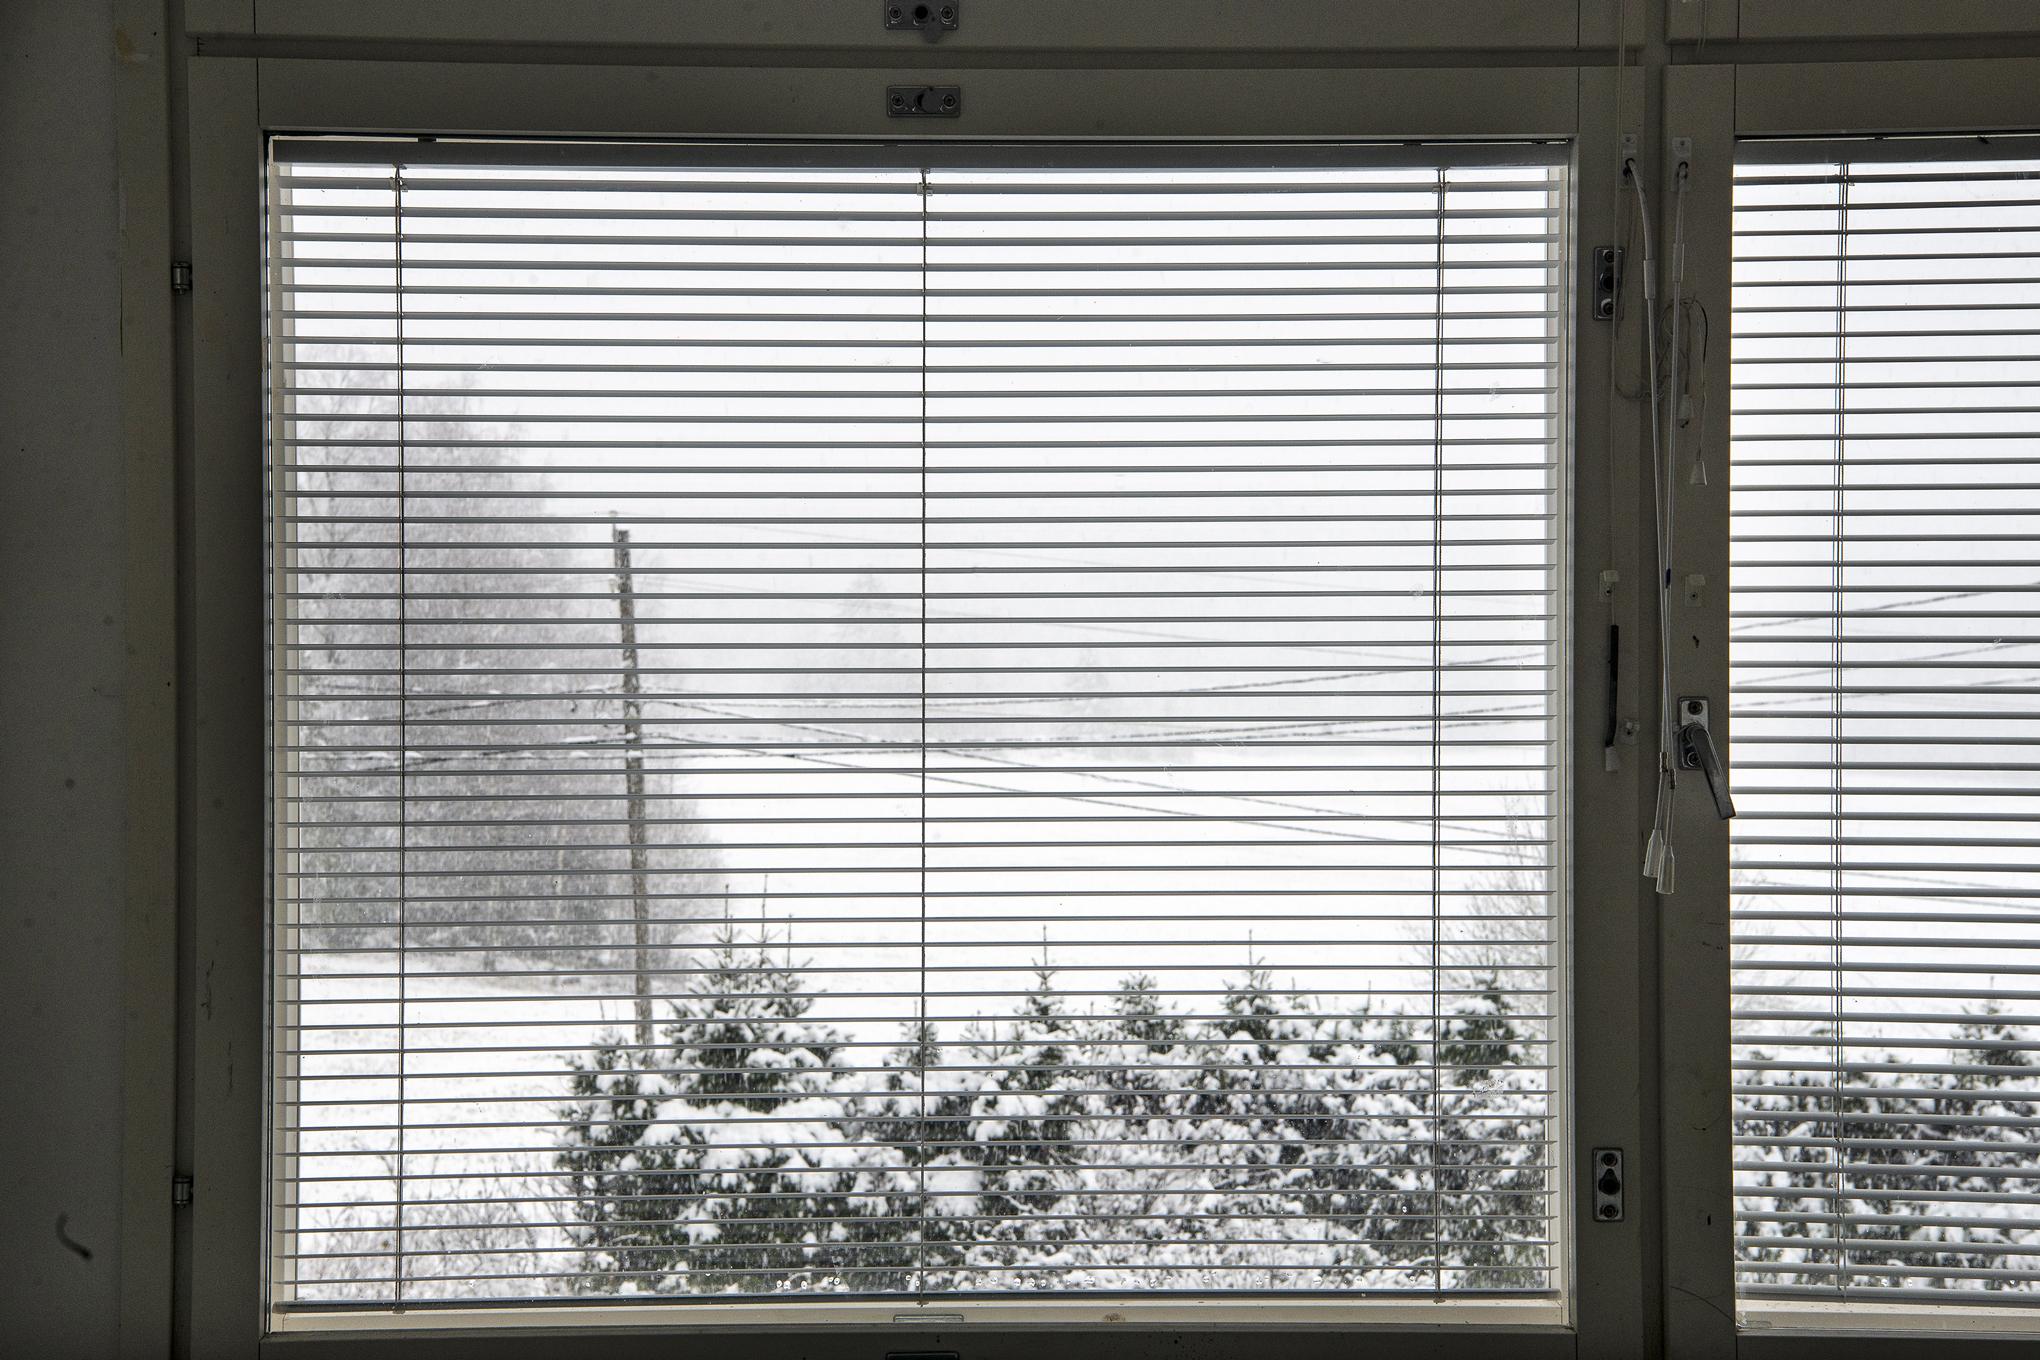 Through The Window 2